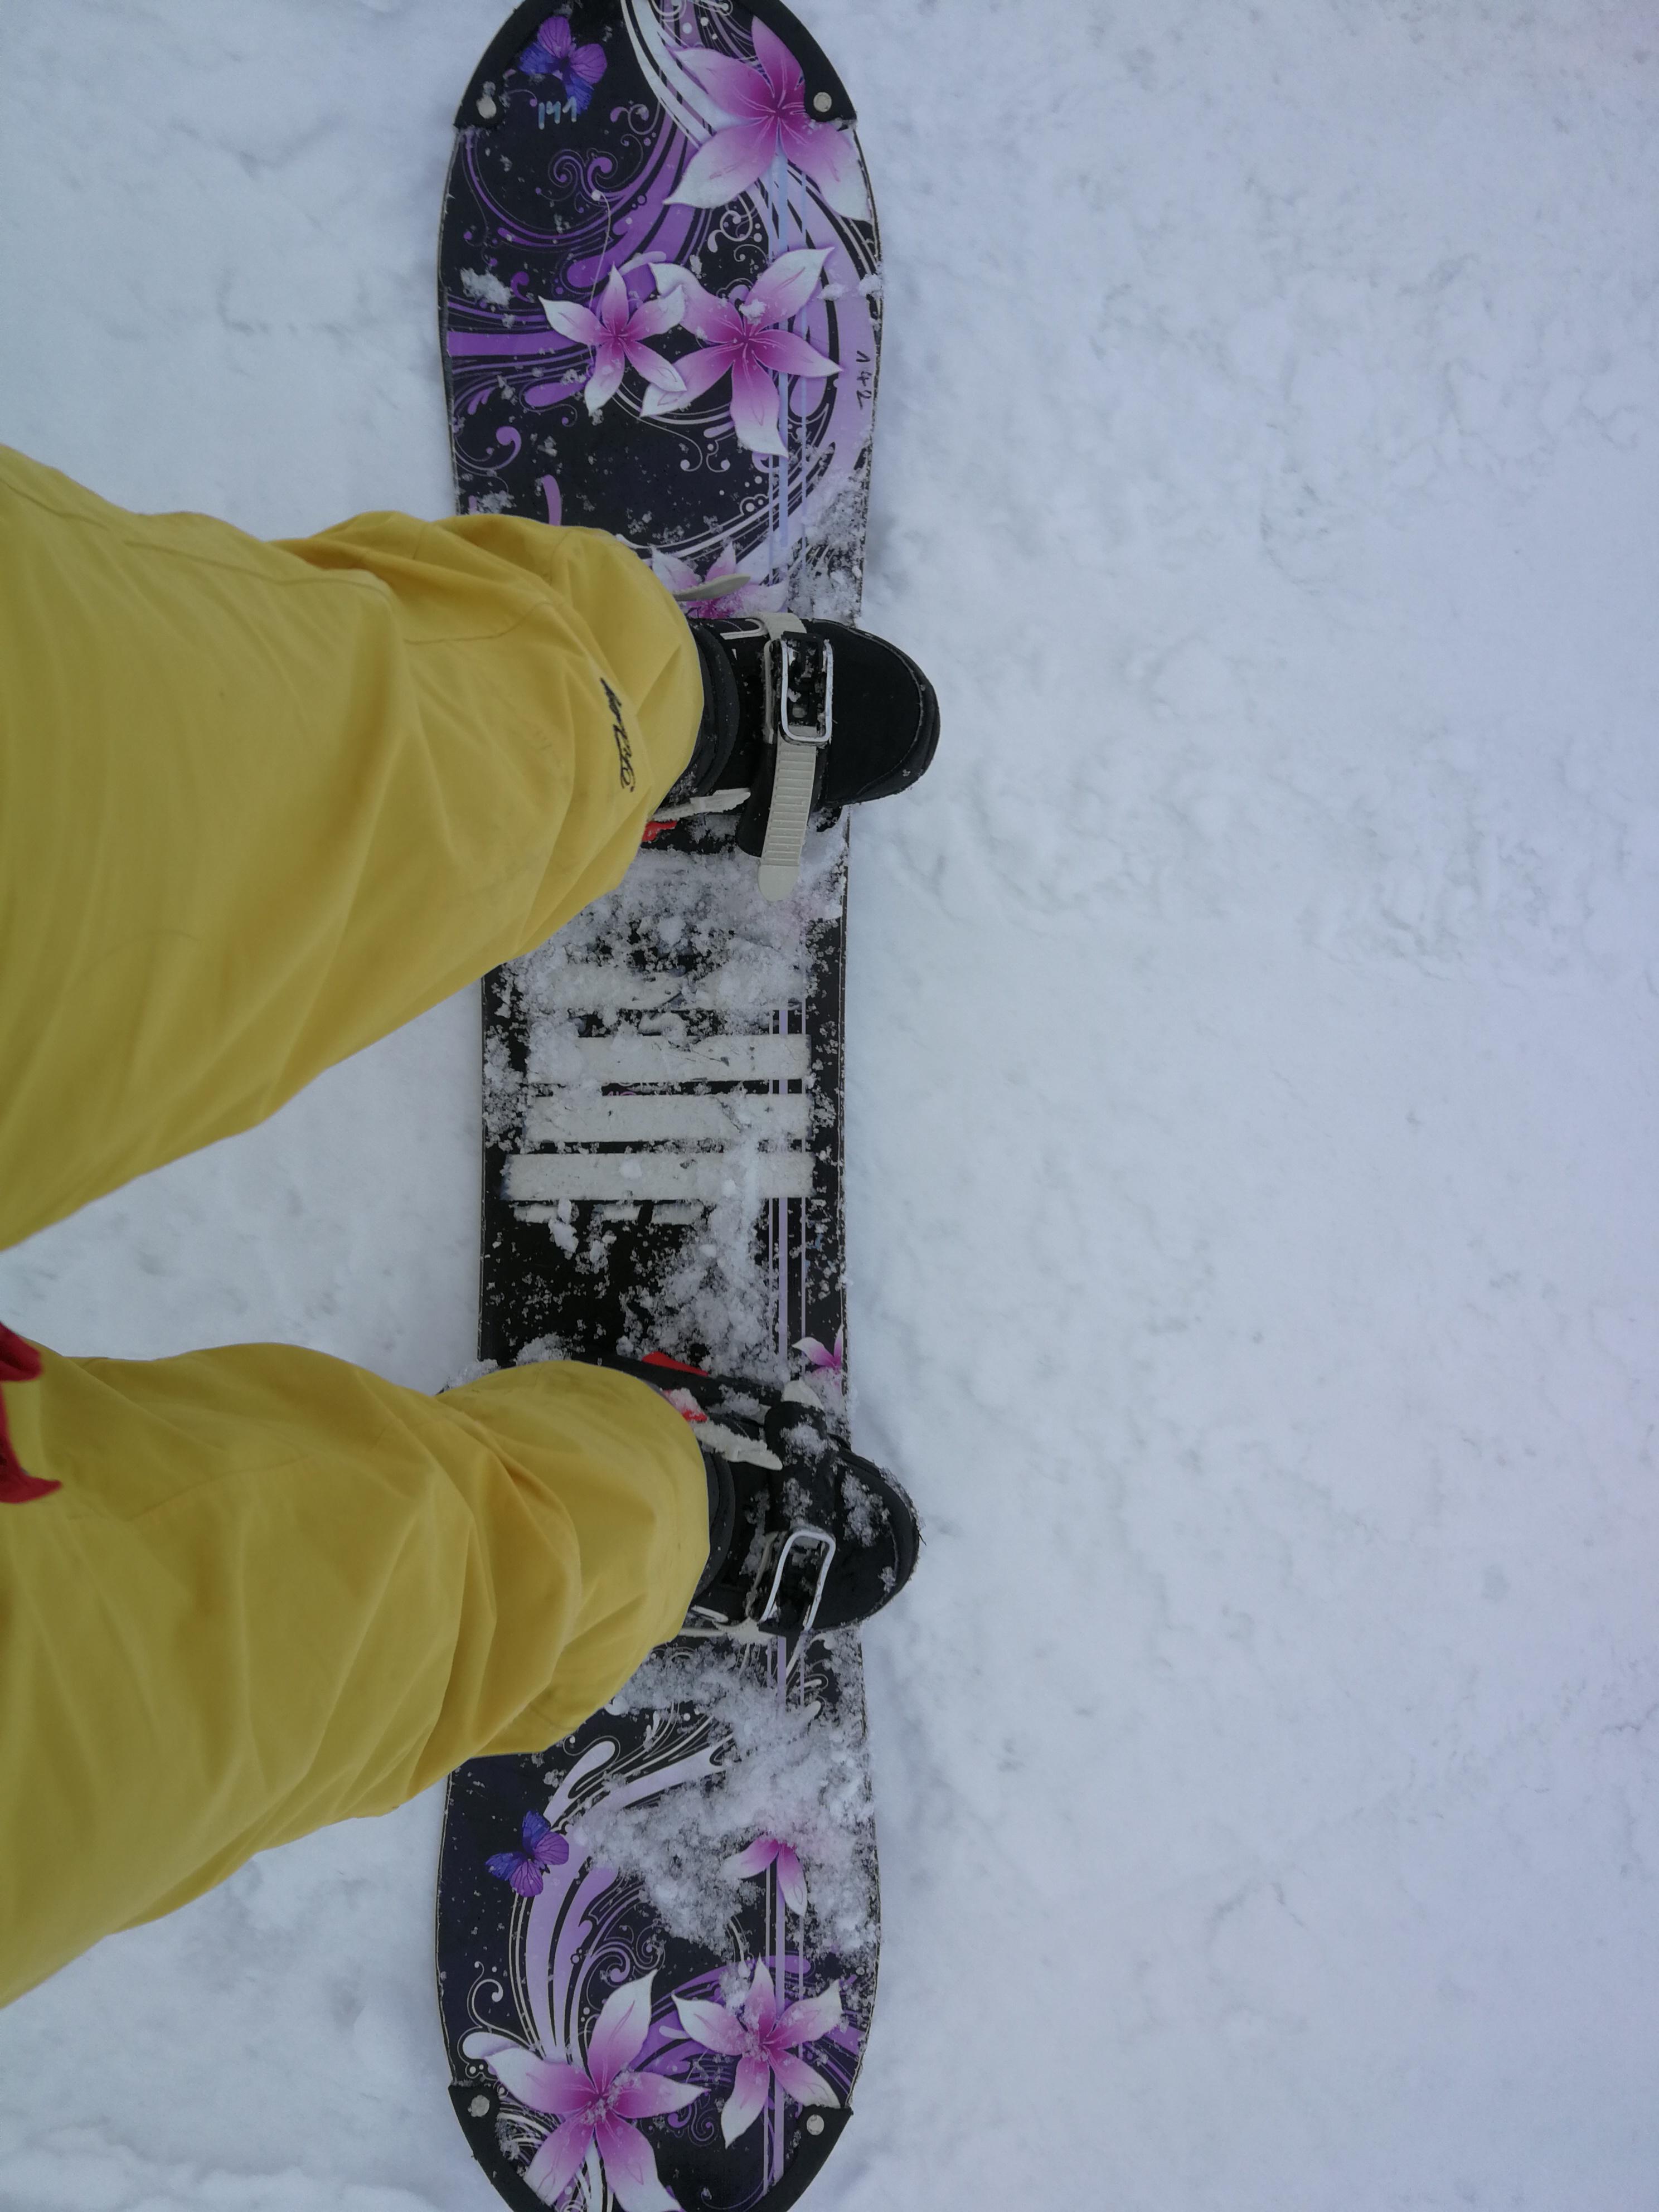 snoboard